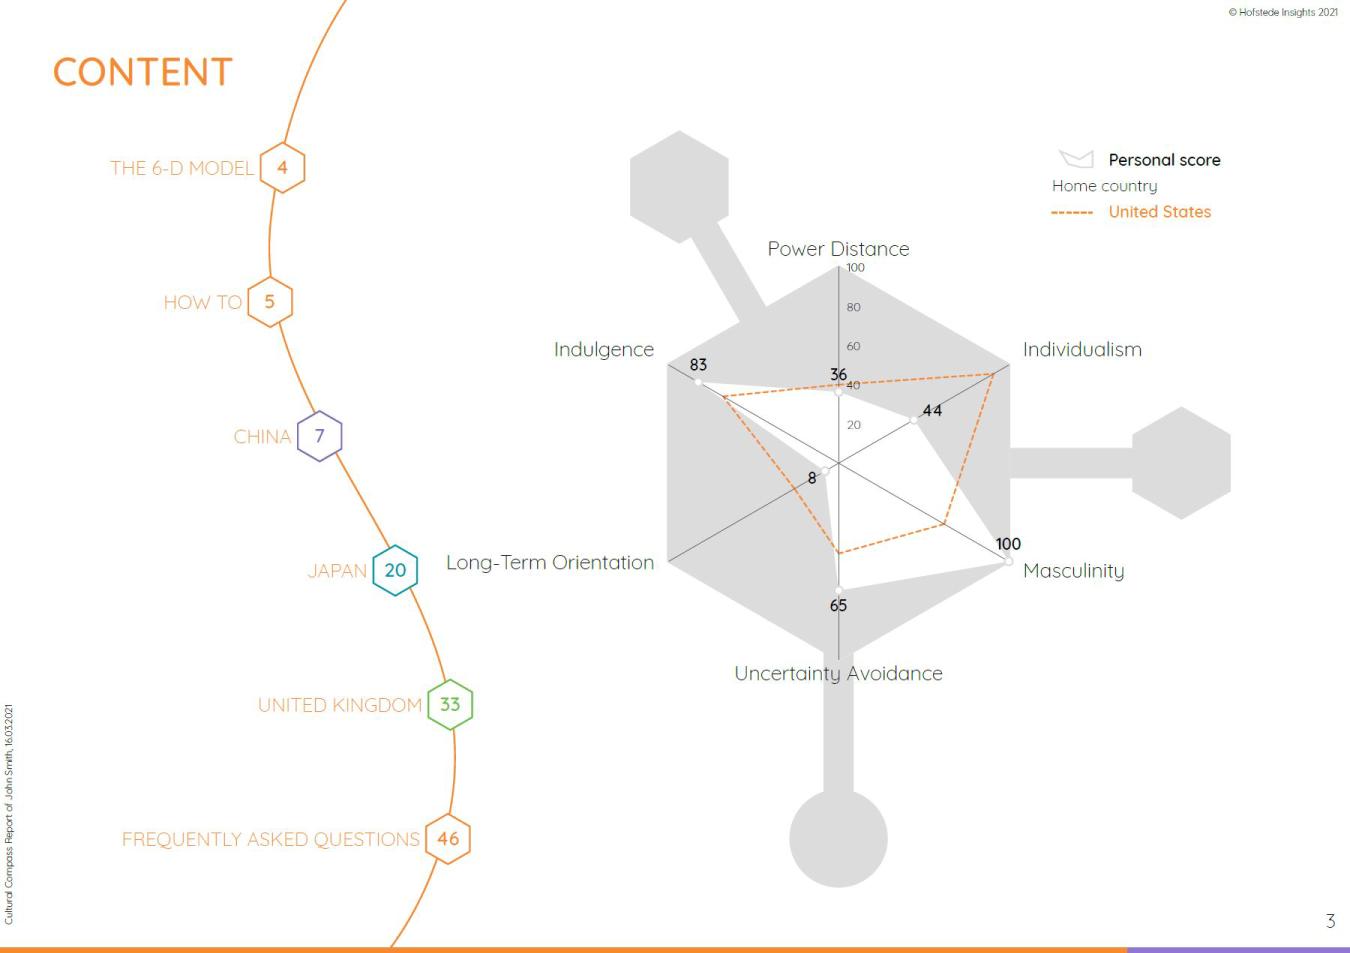 demo-culture-compass-report-1.jpg-2